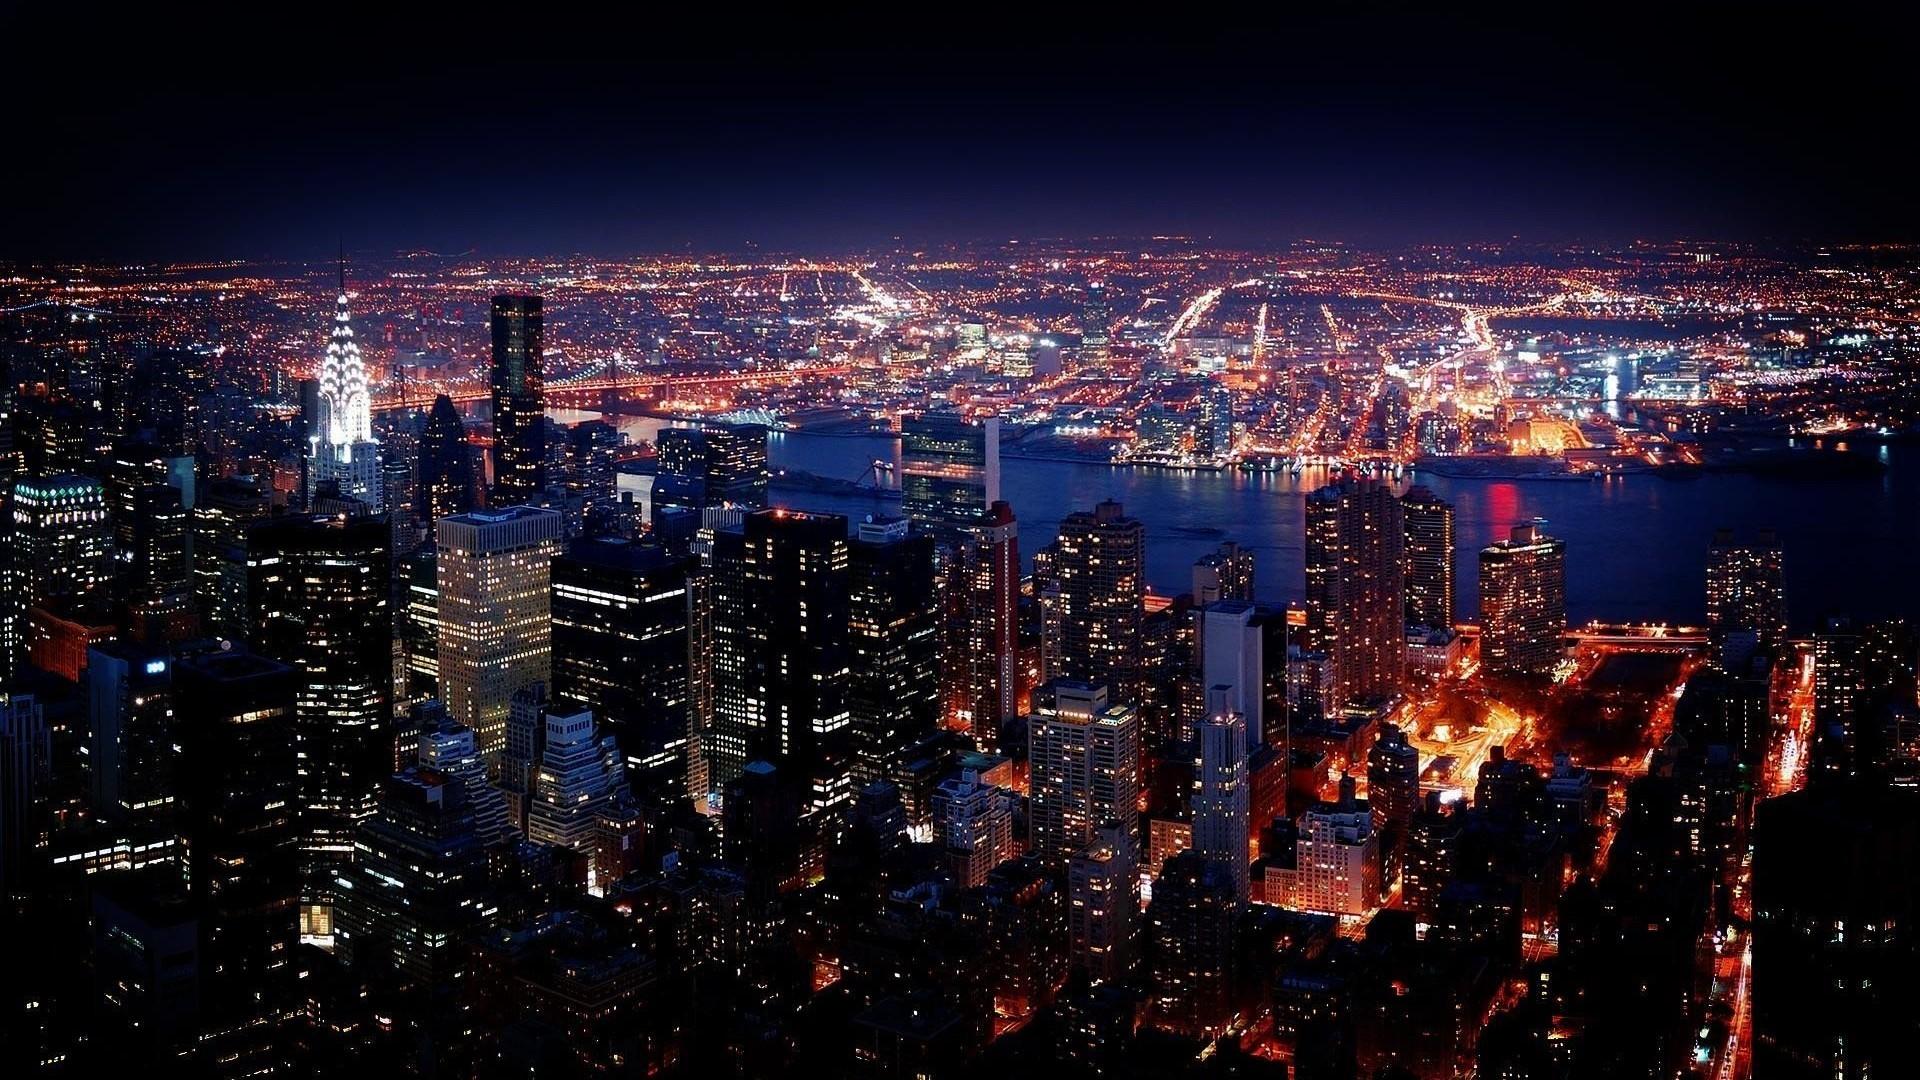 New York City Night View HD Wallpaper